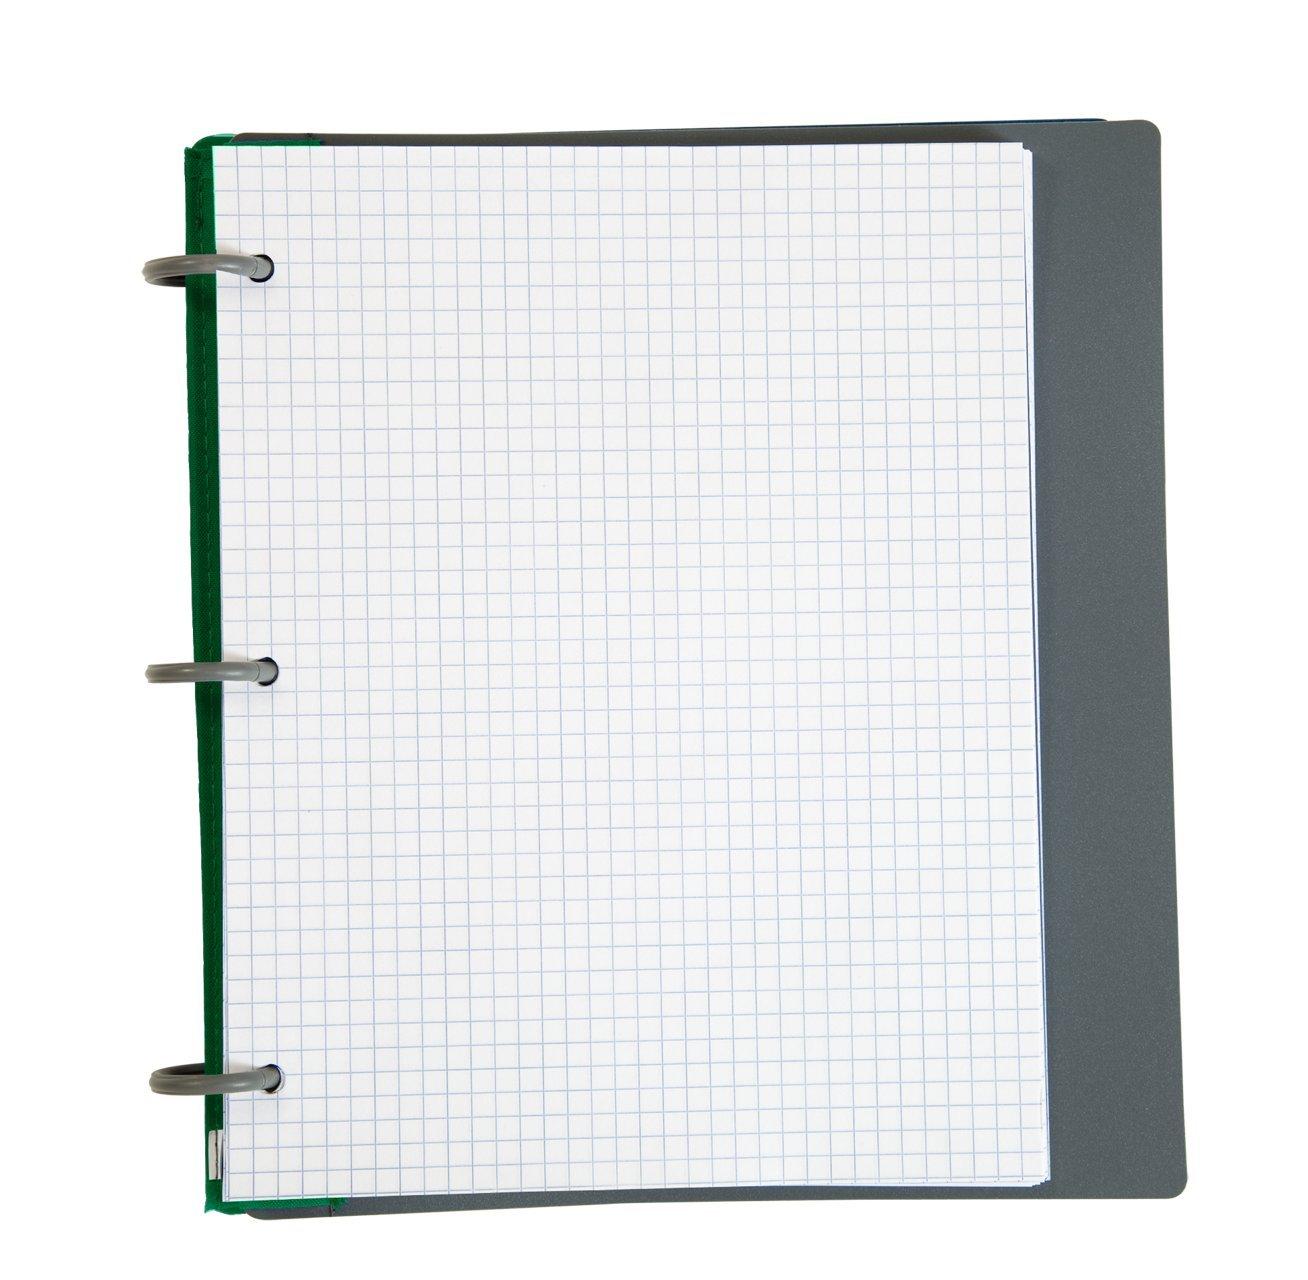 Berry Pink//Purple Five Star Flex NoteBinder 1 Inch Binder 72522 Notebook and Binder All-in-One Customizable